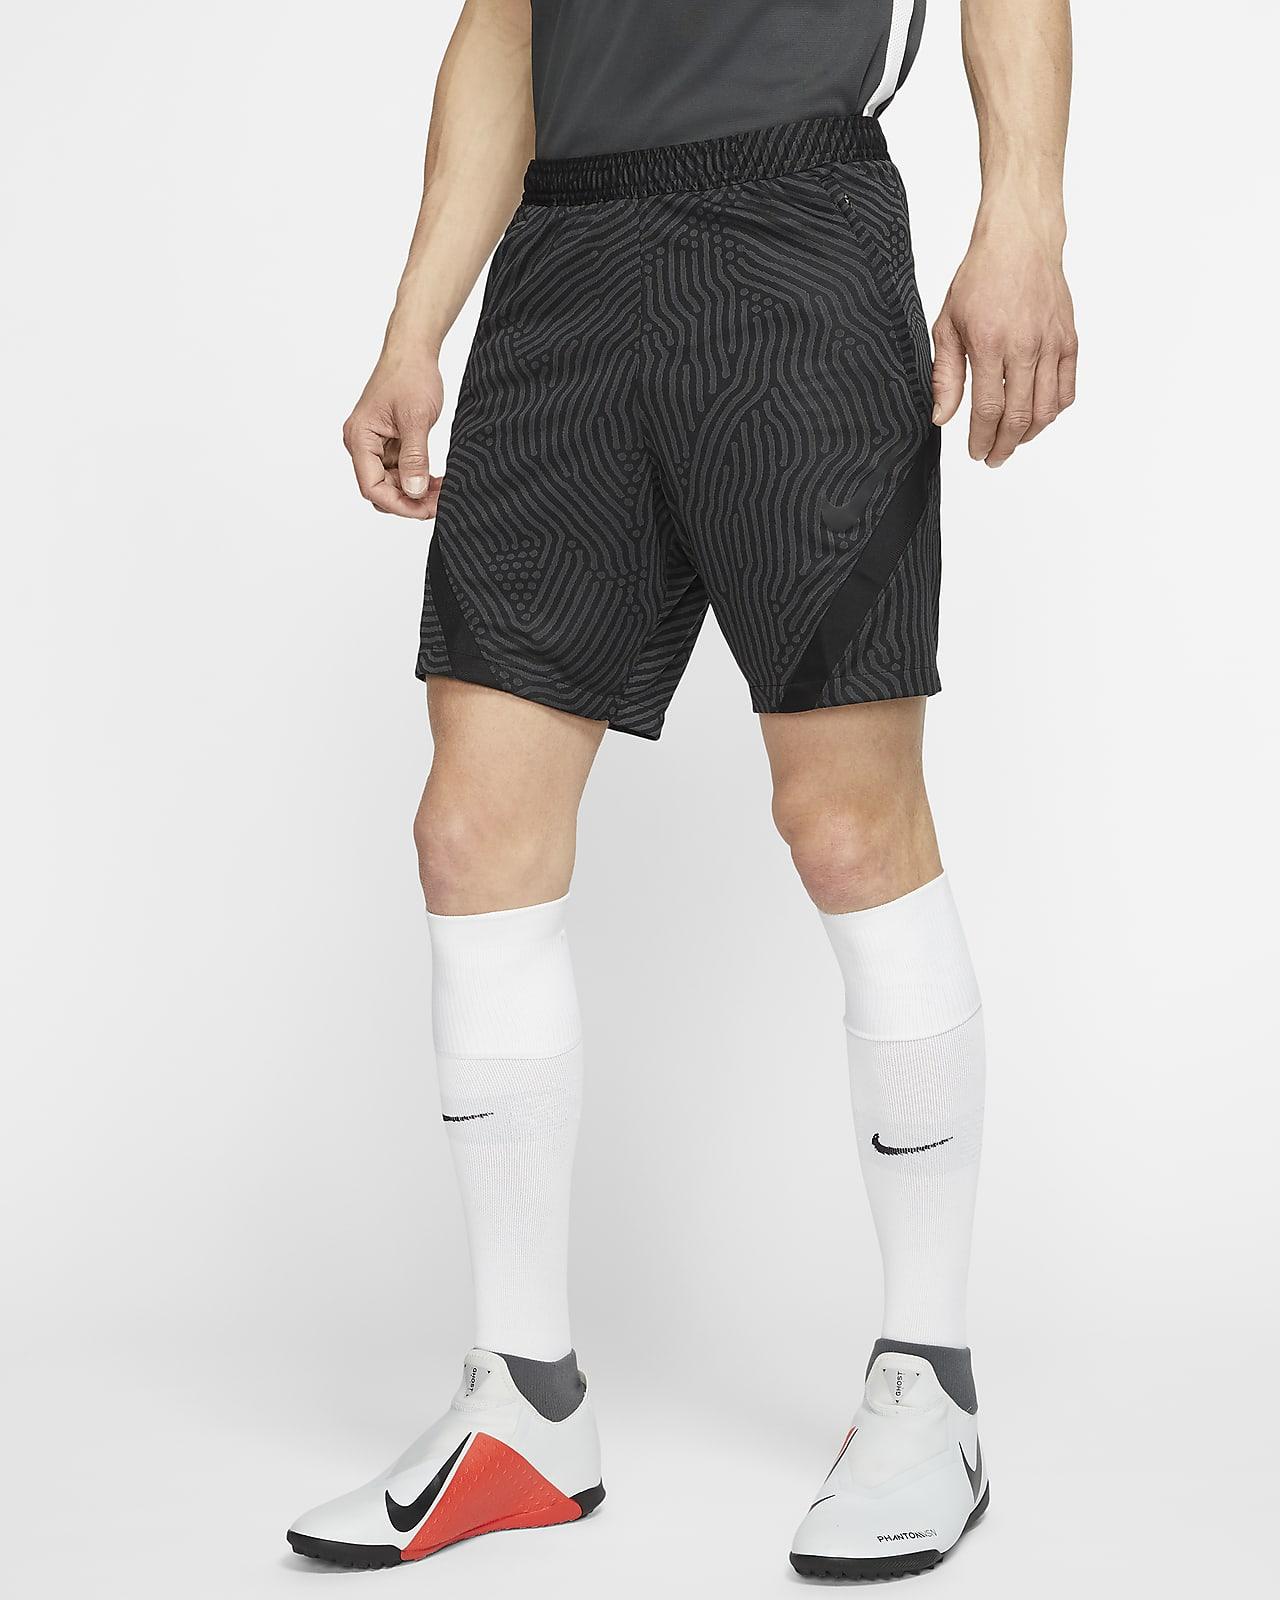 Shorts de fútbol para hombre Nike Dri-FIT Strike